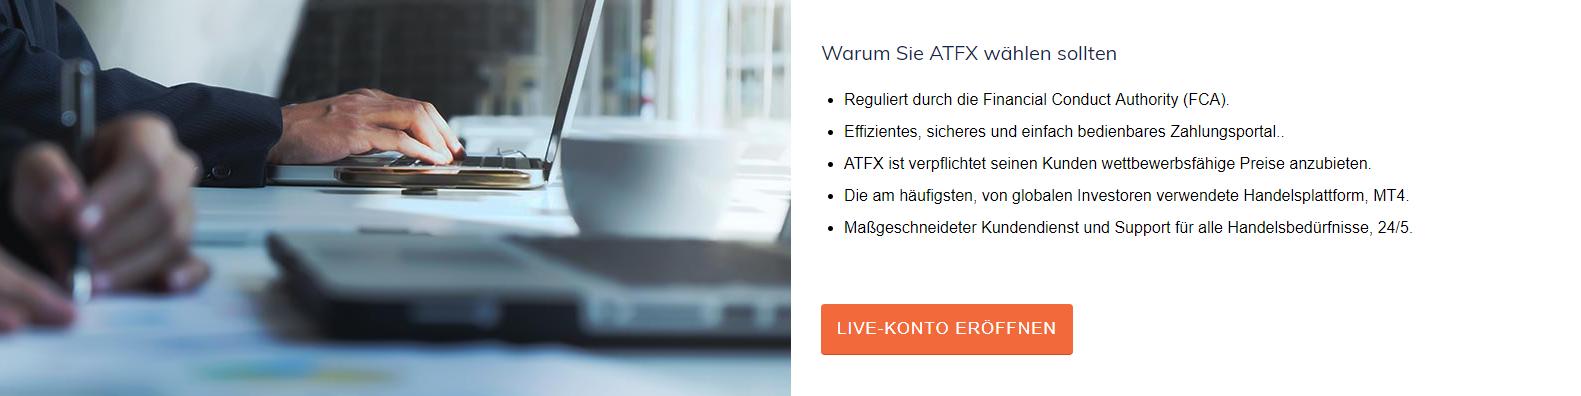 ATFX FOREX Test